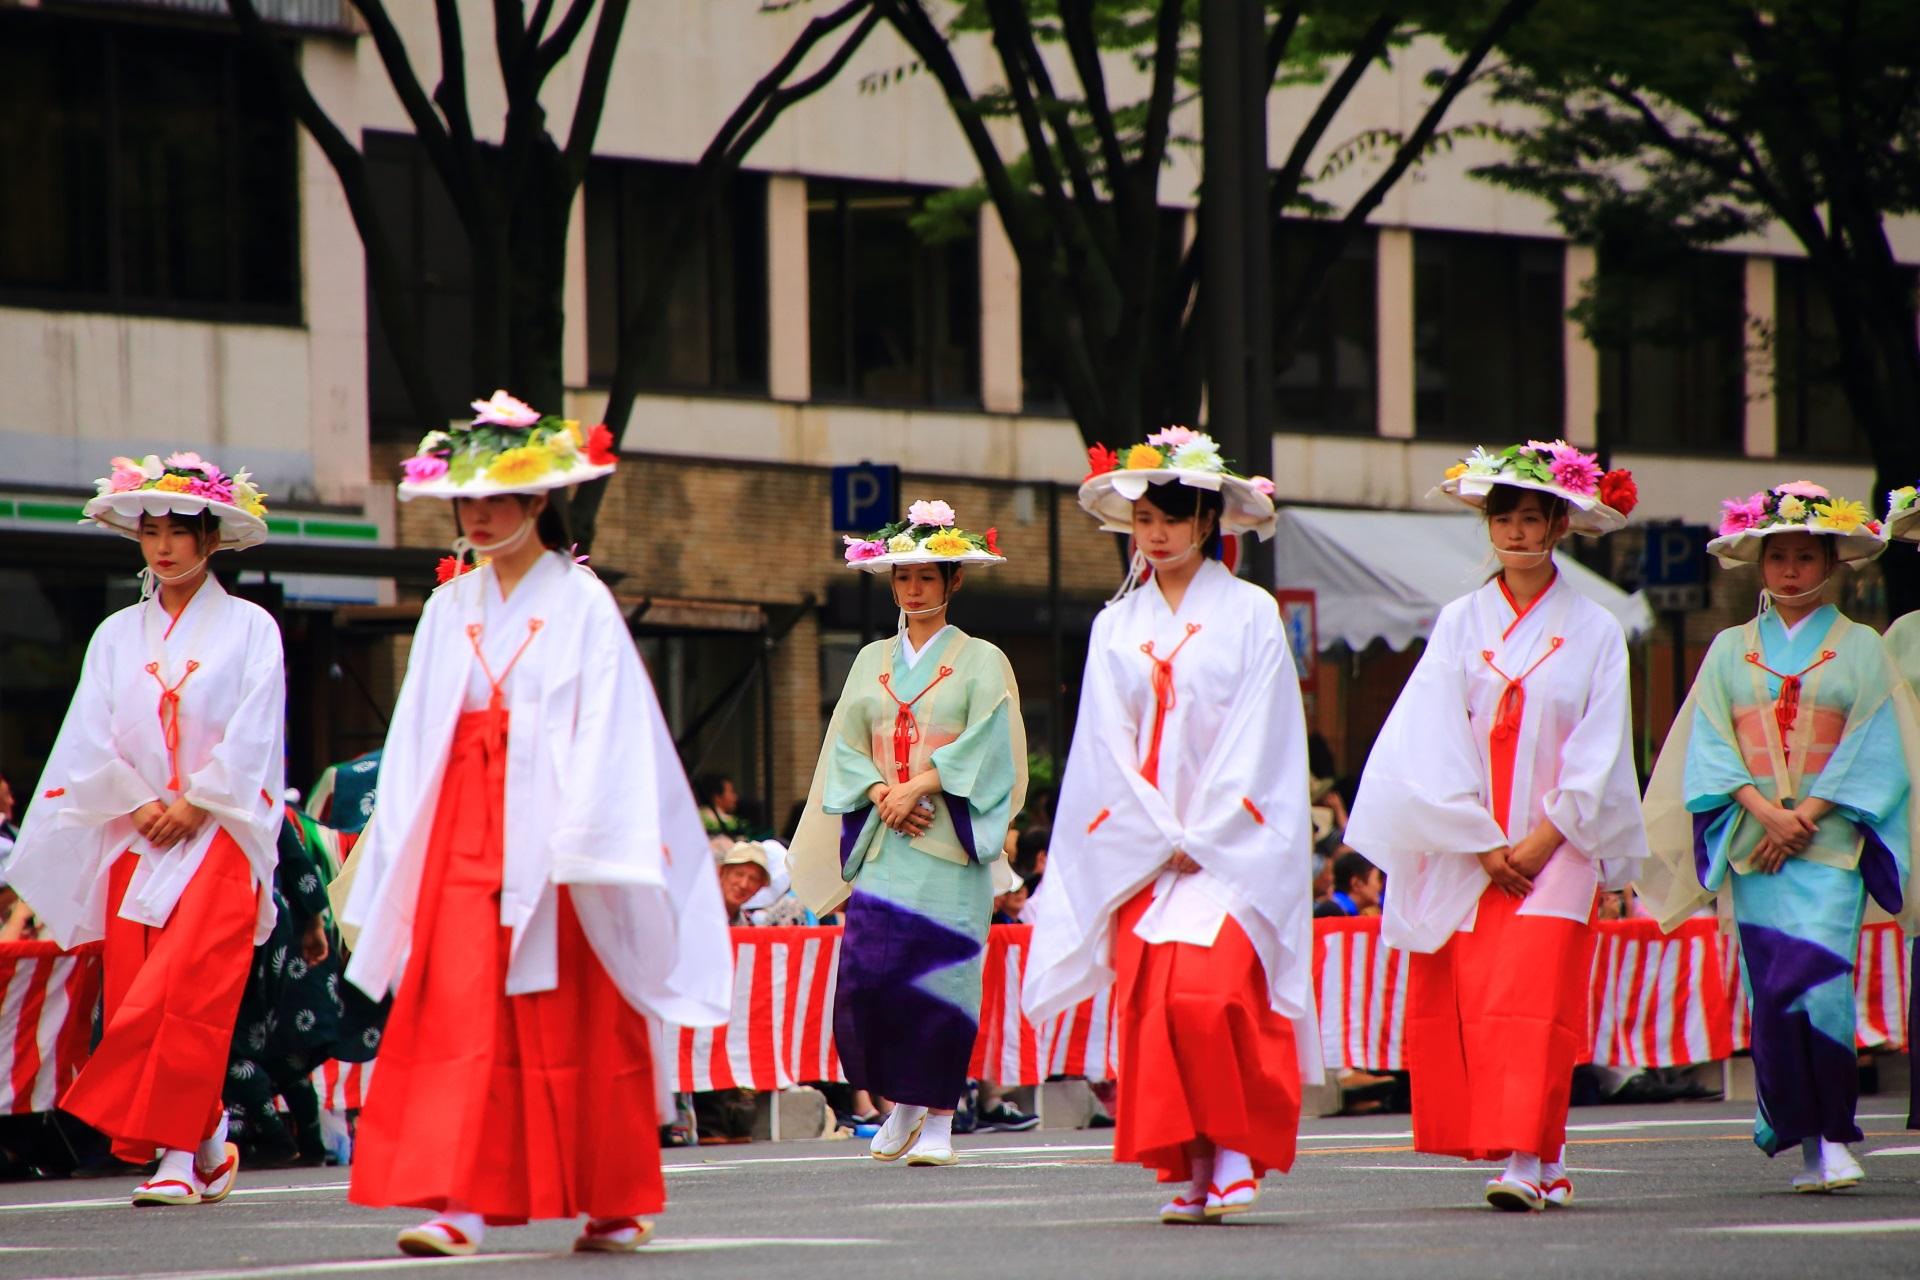 A gorgeous Hanagasa-Junko of the Gion-Matsuri Festival in Kyoto